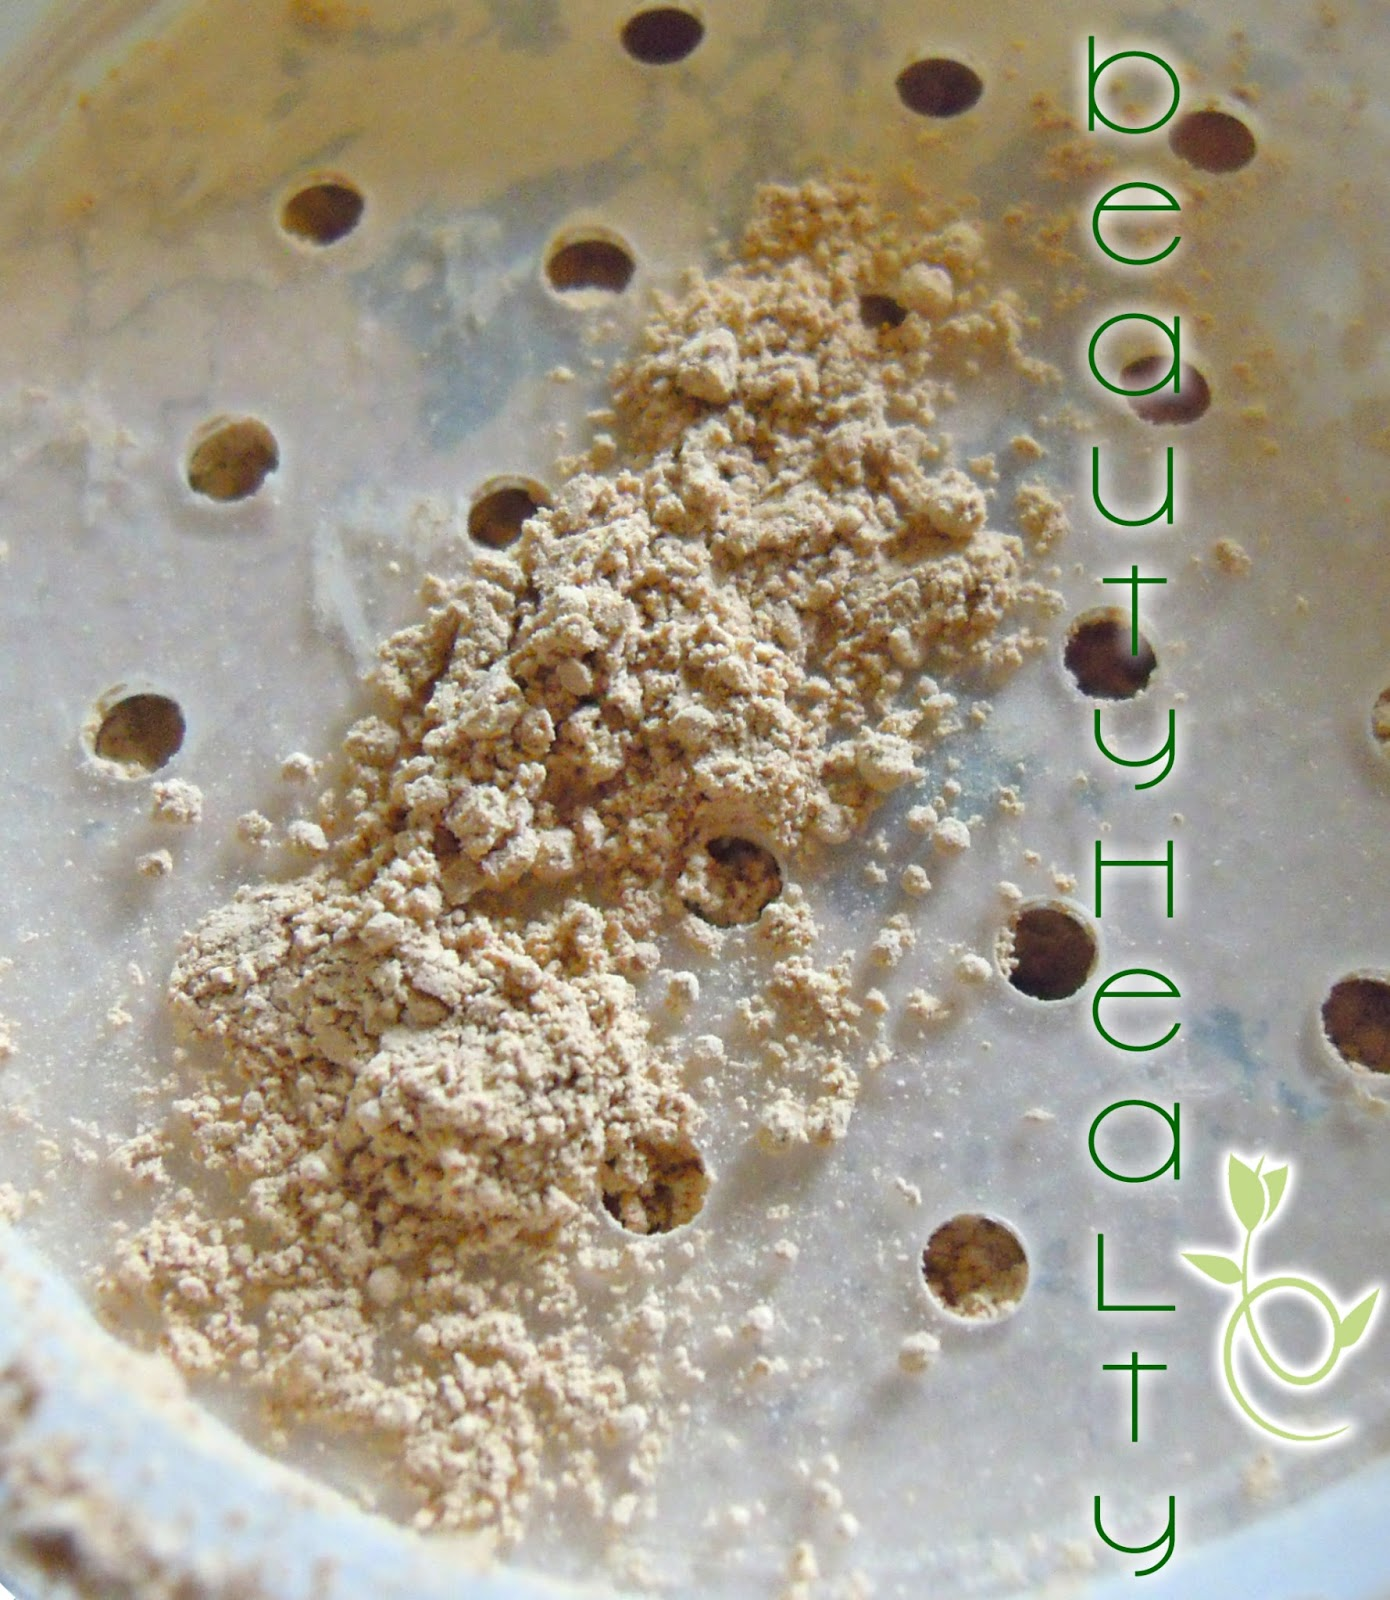 benecos polvere minerale